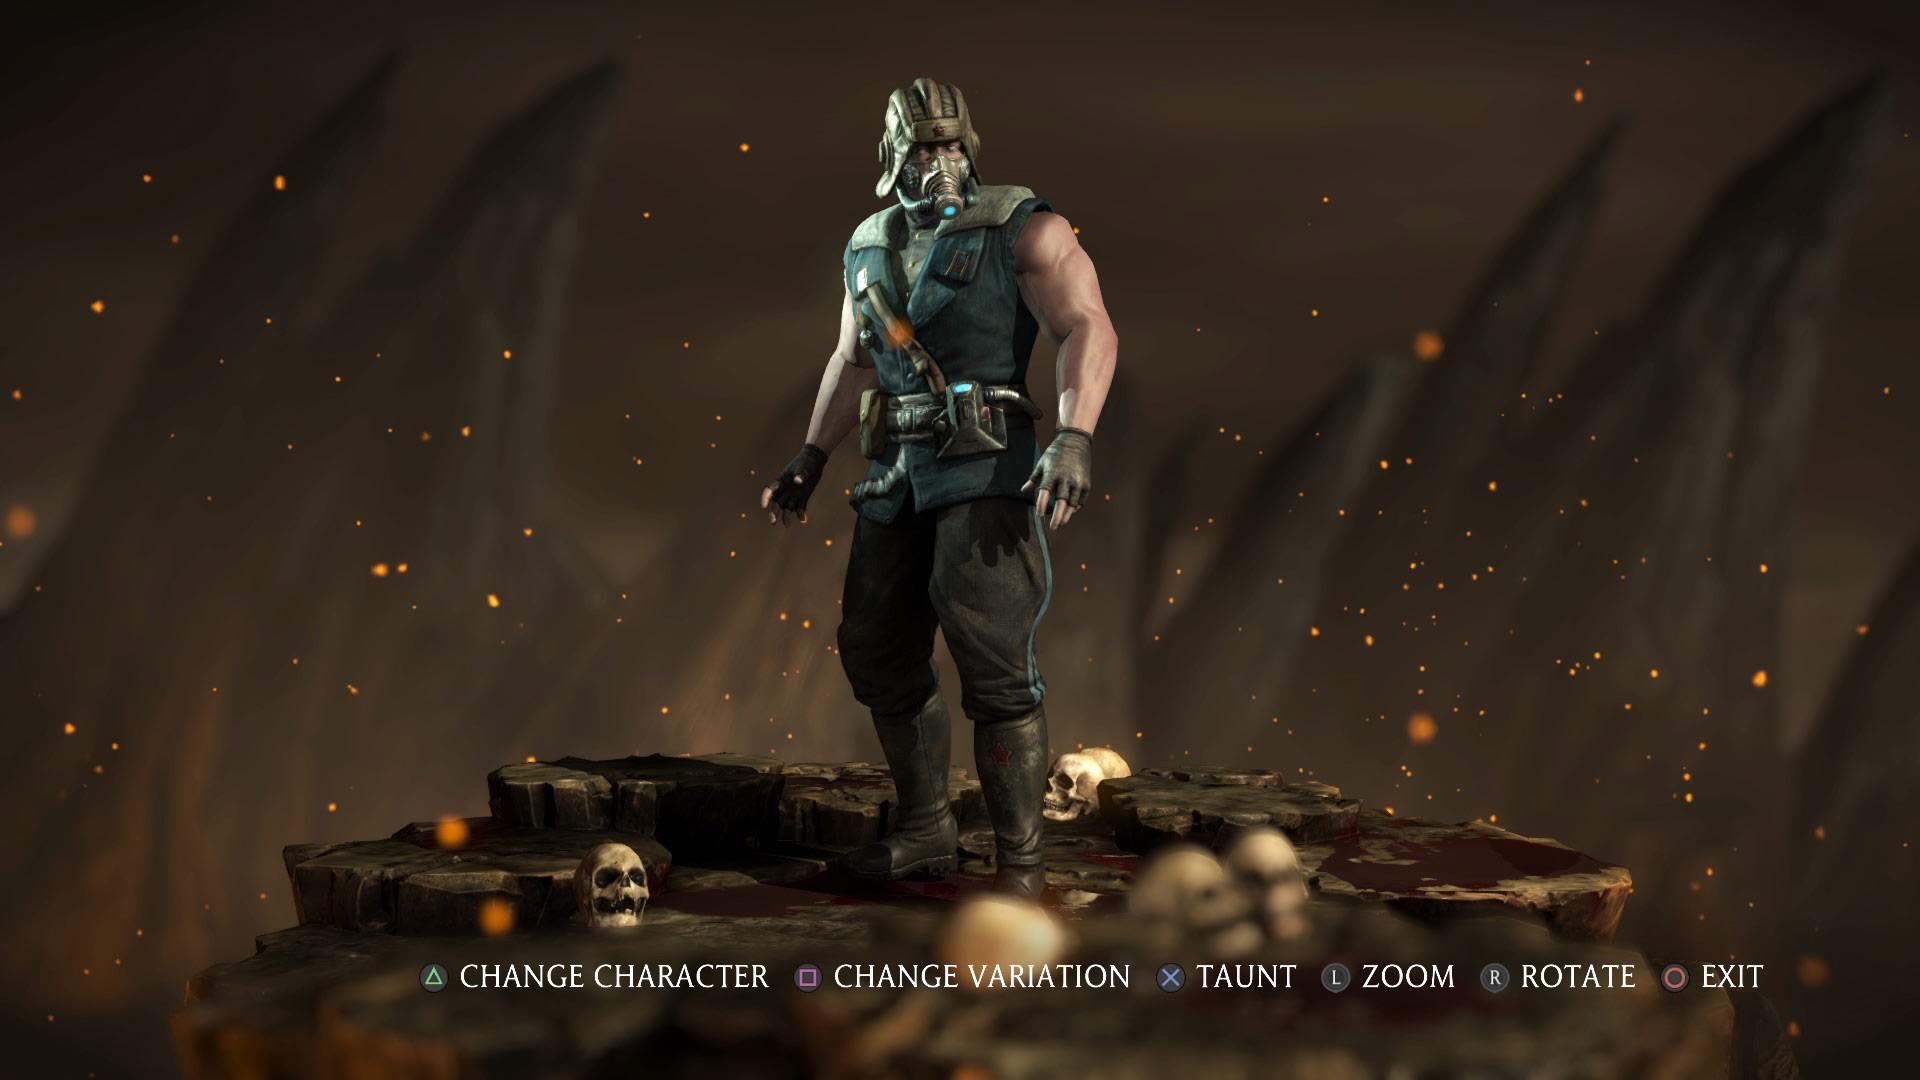 Mortal Kombat XL Kombat Pack 2  8 out of 14 image gallery